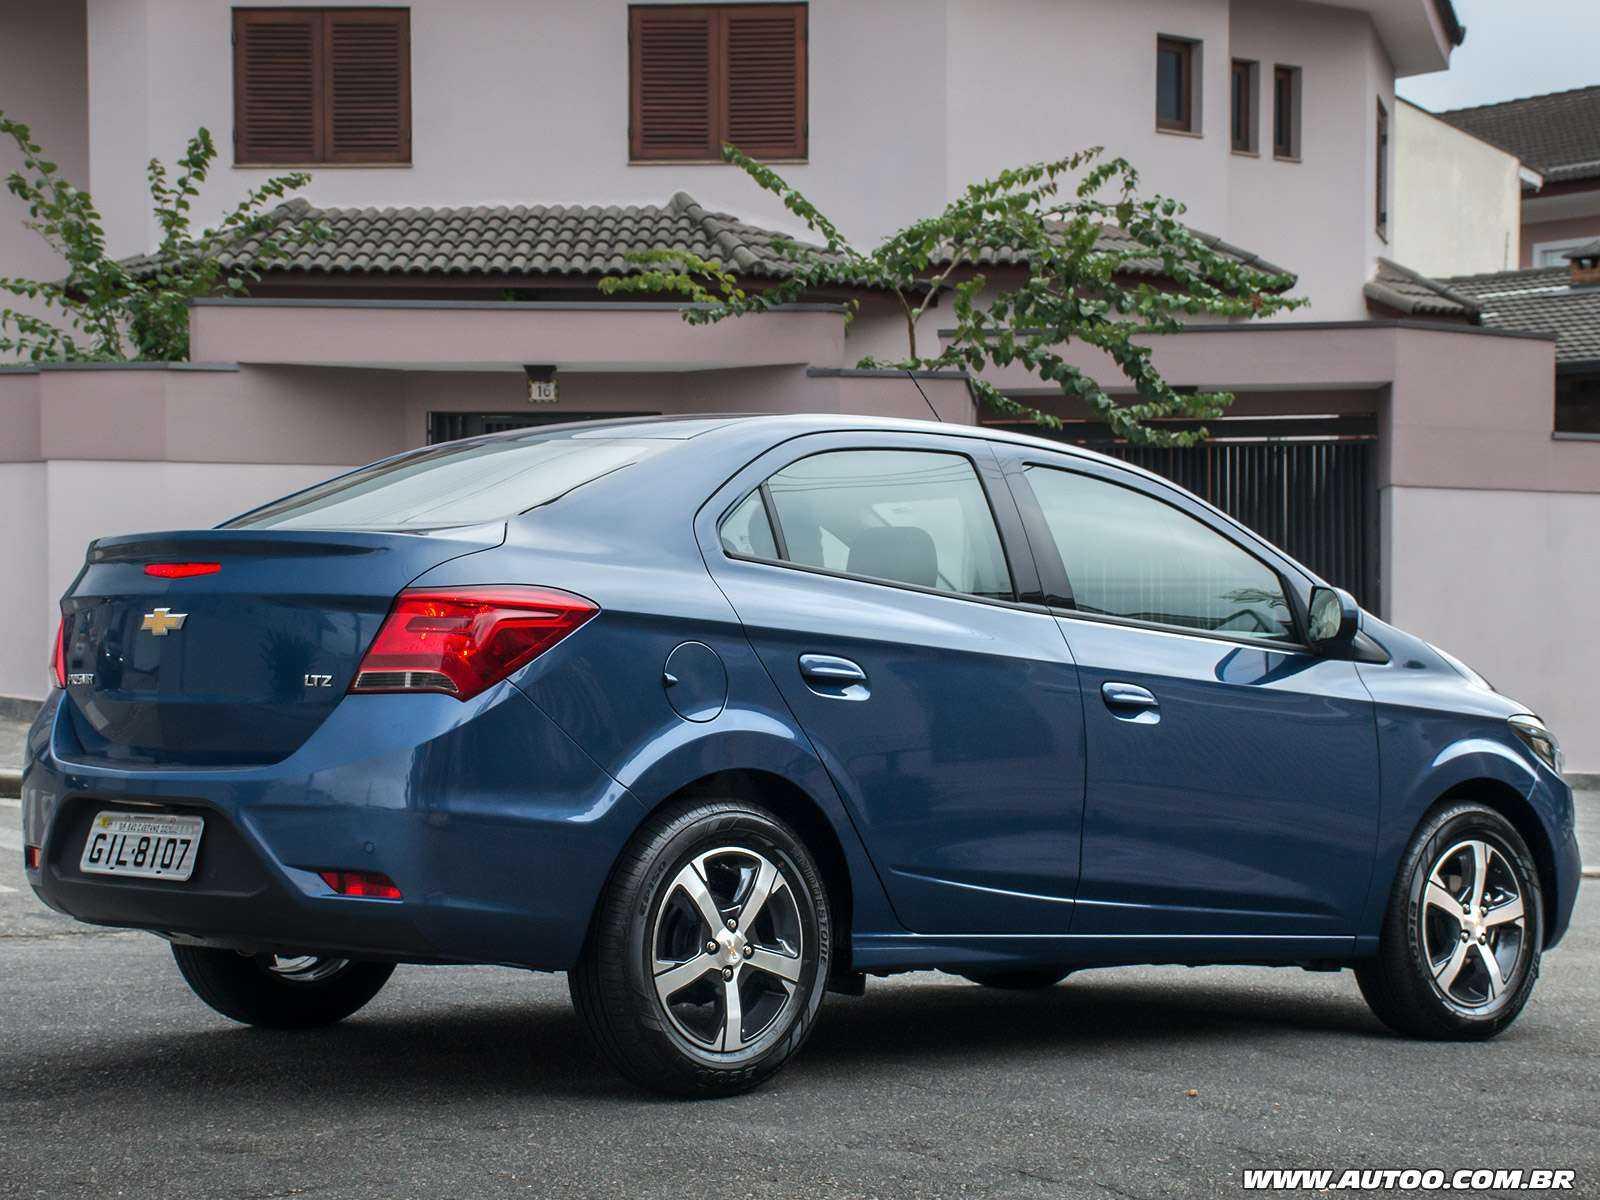 ChevroletPrisma 2019 - ângulo traseiro